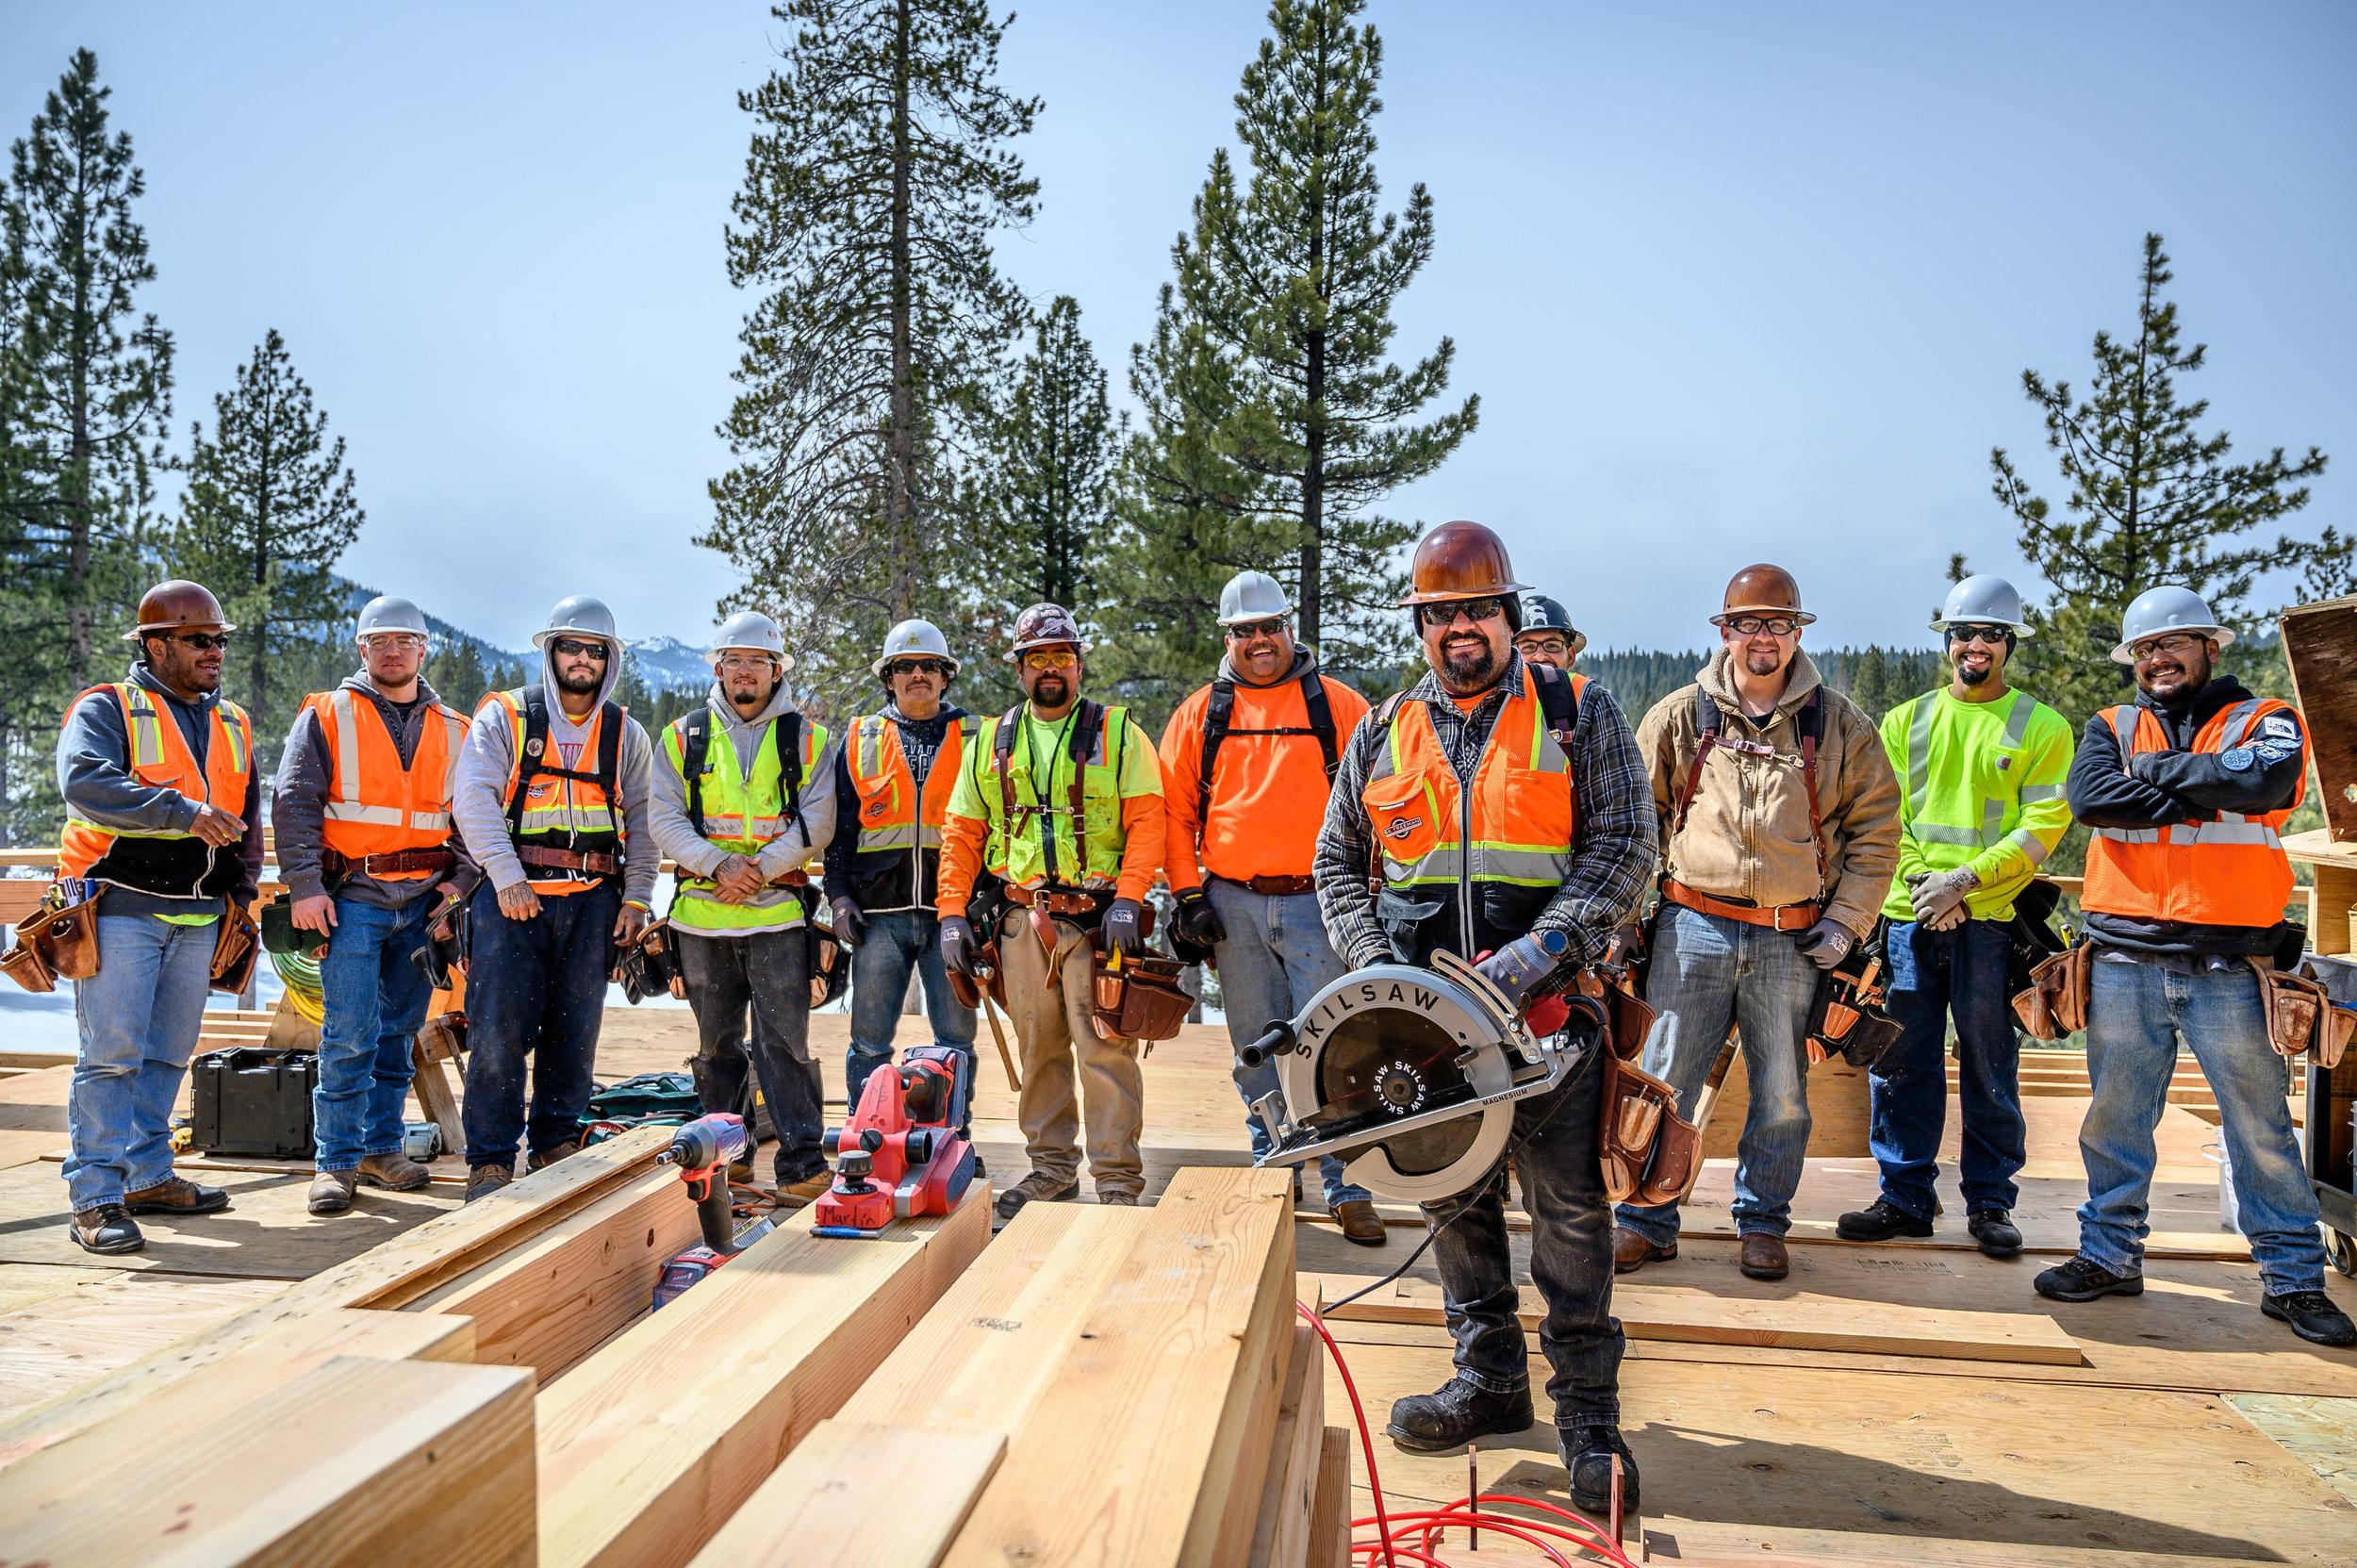 S.R. Freeman is proud to serve the following areas: - SAN FRANCISCO PENINSULAAtherton - Belmont - Hillsborough - Menlo Park - Portola Valley - San Carlos - San Mateo - San Francisco - WoodsideSOUTH BAY - Campbell - Cupertino - Gilroy - Hollister - Los Gatos - Los Altos - Los Altos Hills - Milpitas - Monte Sereno - Morgan Hill - Mountain View - Palo Alto - San Martin - San Jose - San Juan Bautista - Santa Clara - Saratoga - SunnyvaleMONTEREY PENINSULAMonterey - Pacific Grove - Pebble Beach - Carmel-by-the-Sea - Santa Lucia PreserveNORTH BAY/WINE COUNTRYMarin - Mill Valley - Belvedere/Tiburon - Healdsburg - Kentfield - Napa - Petaluma - Ross - Rutherford - San Rafael - Santa Rosa - Sonoma - YountvilleLAKE TAHOE